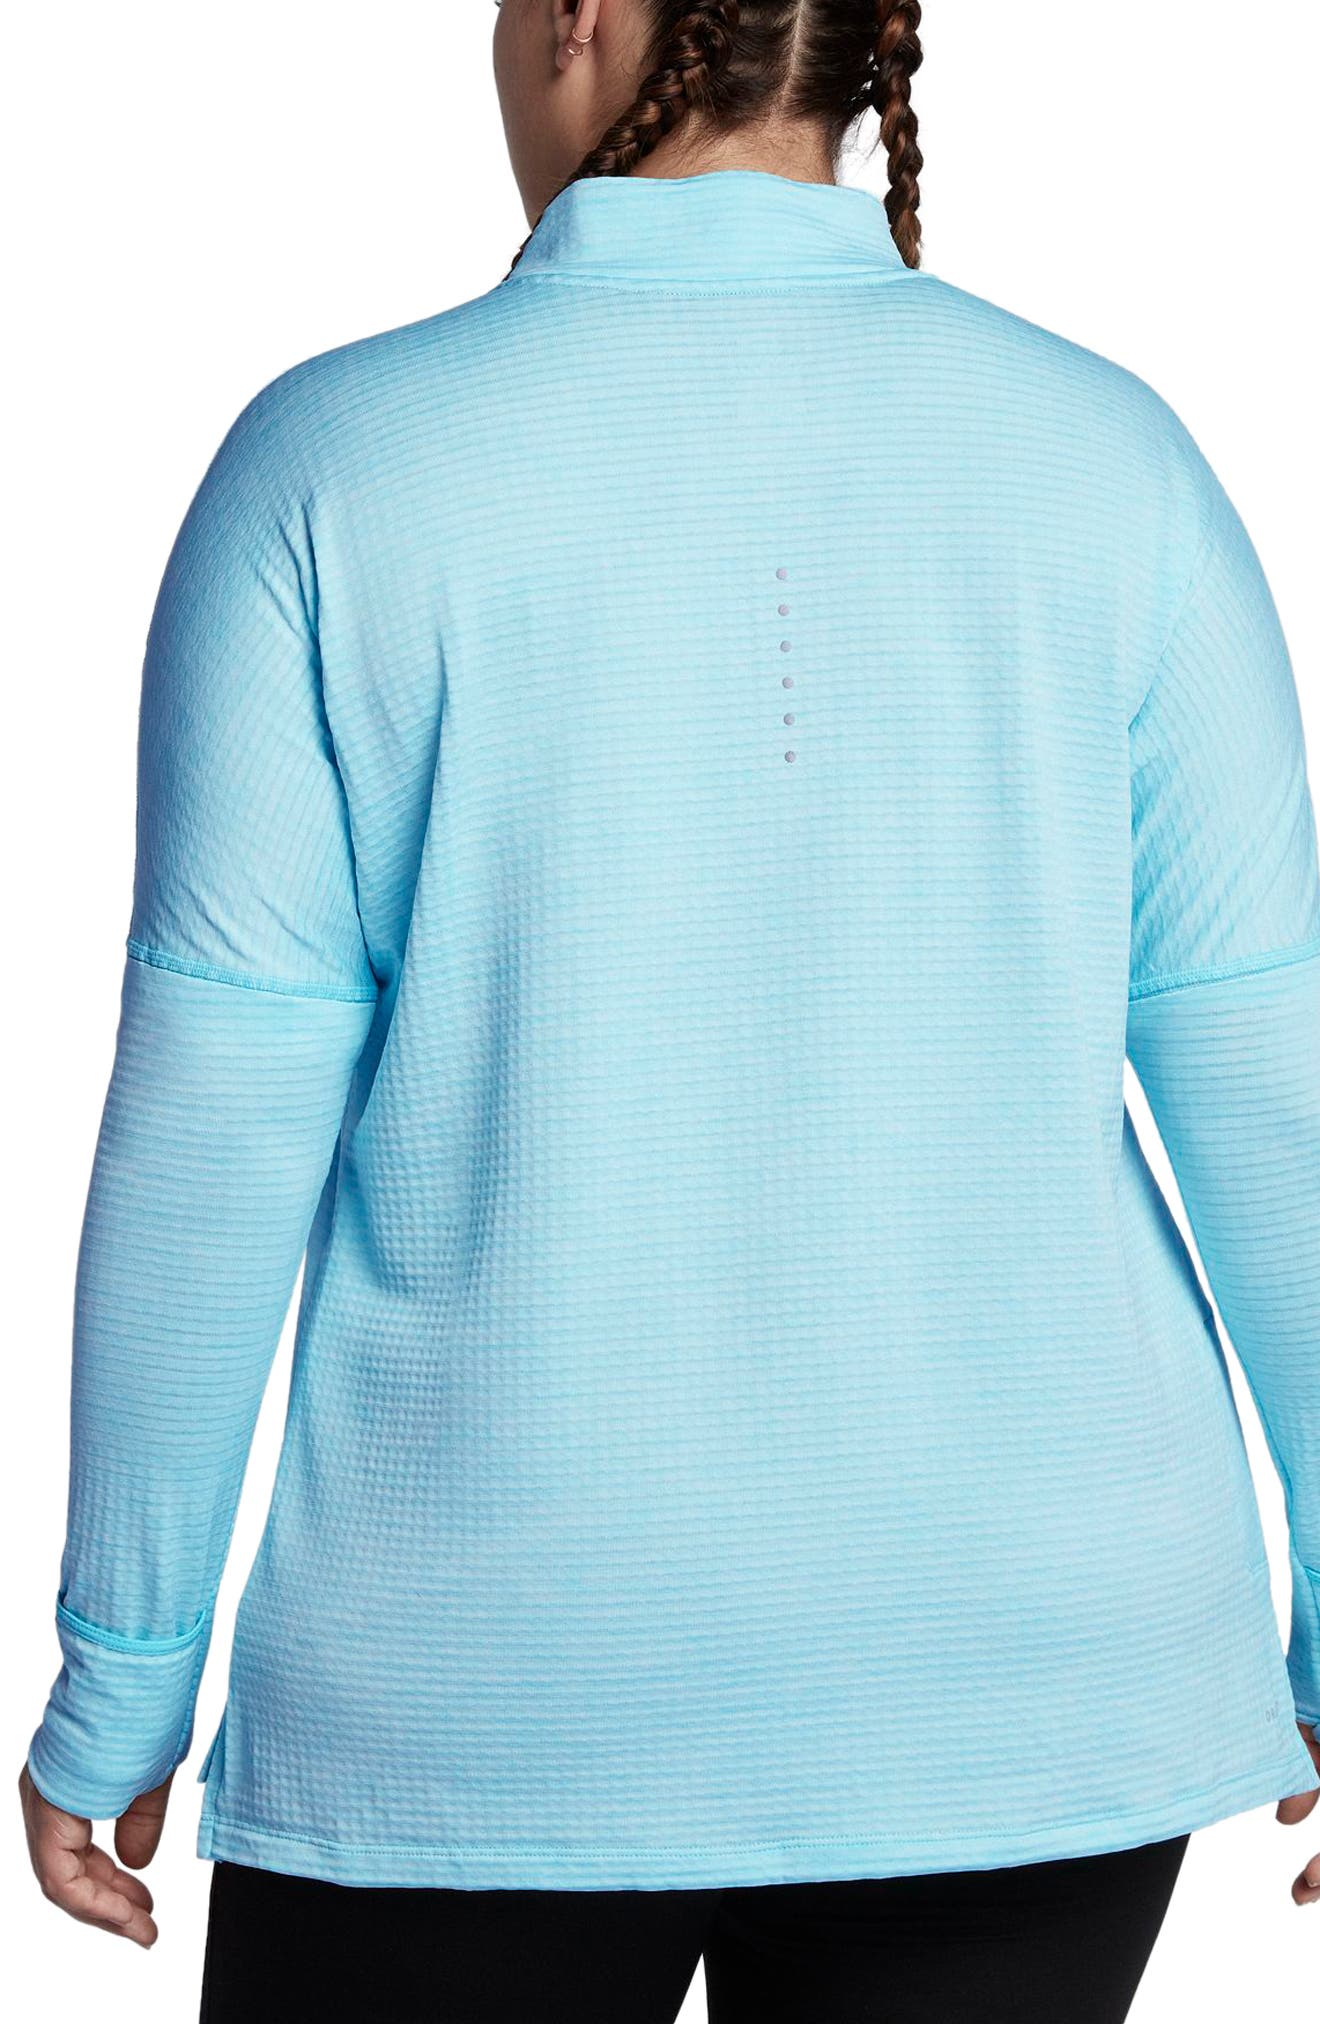 Alternate Image 2  - Nike Sphere Element Long Sleeve Running Top (Plus Size)